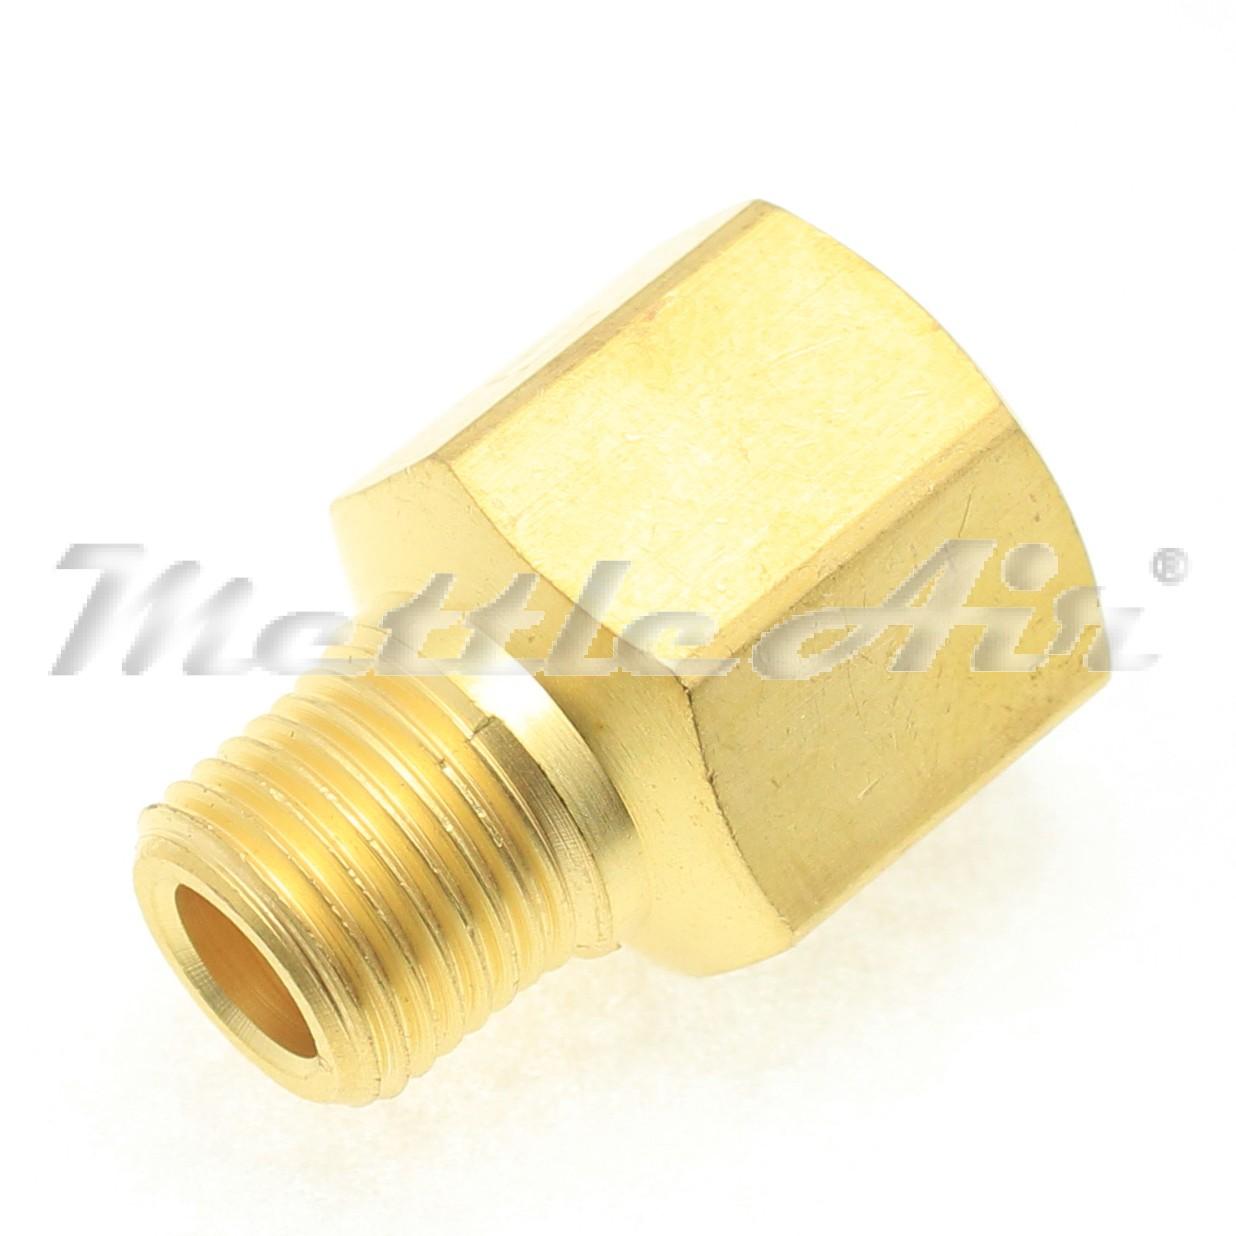 5FL Whitworth British Straight Pipe Plug Tap 3//4-14 BSPP G 3//4